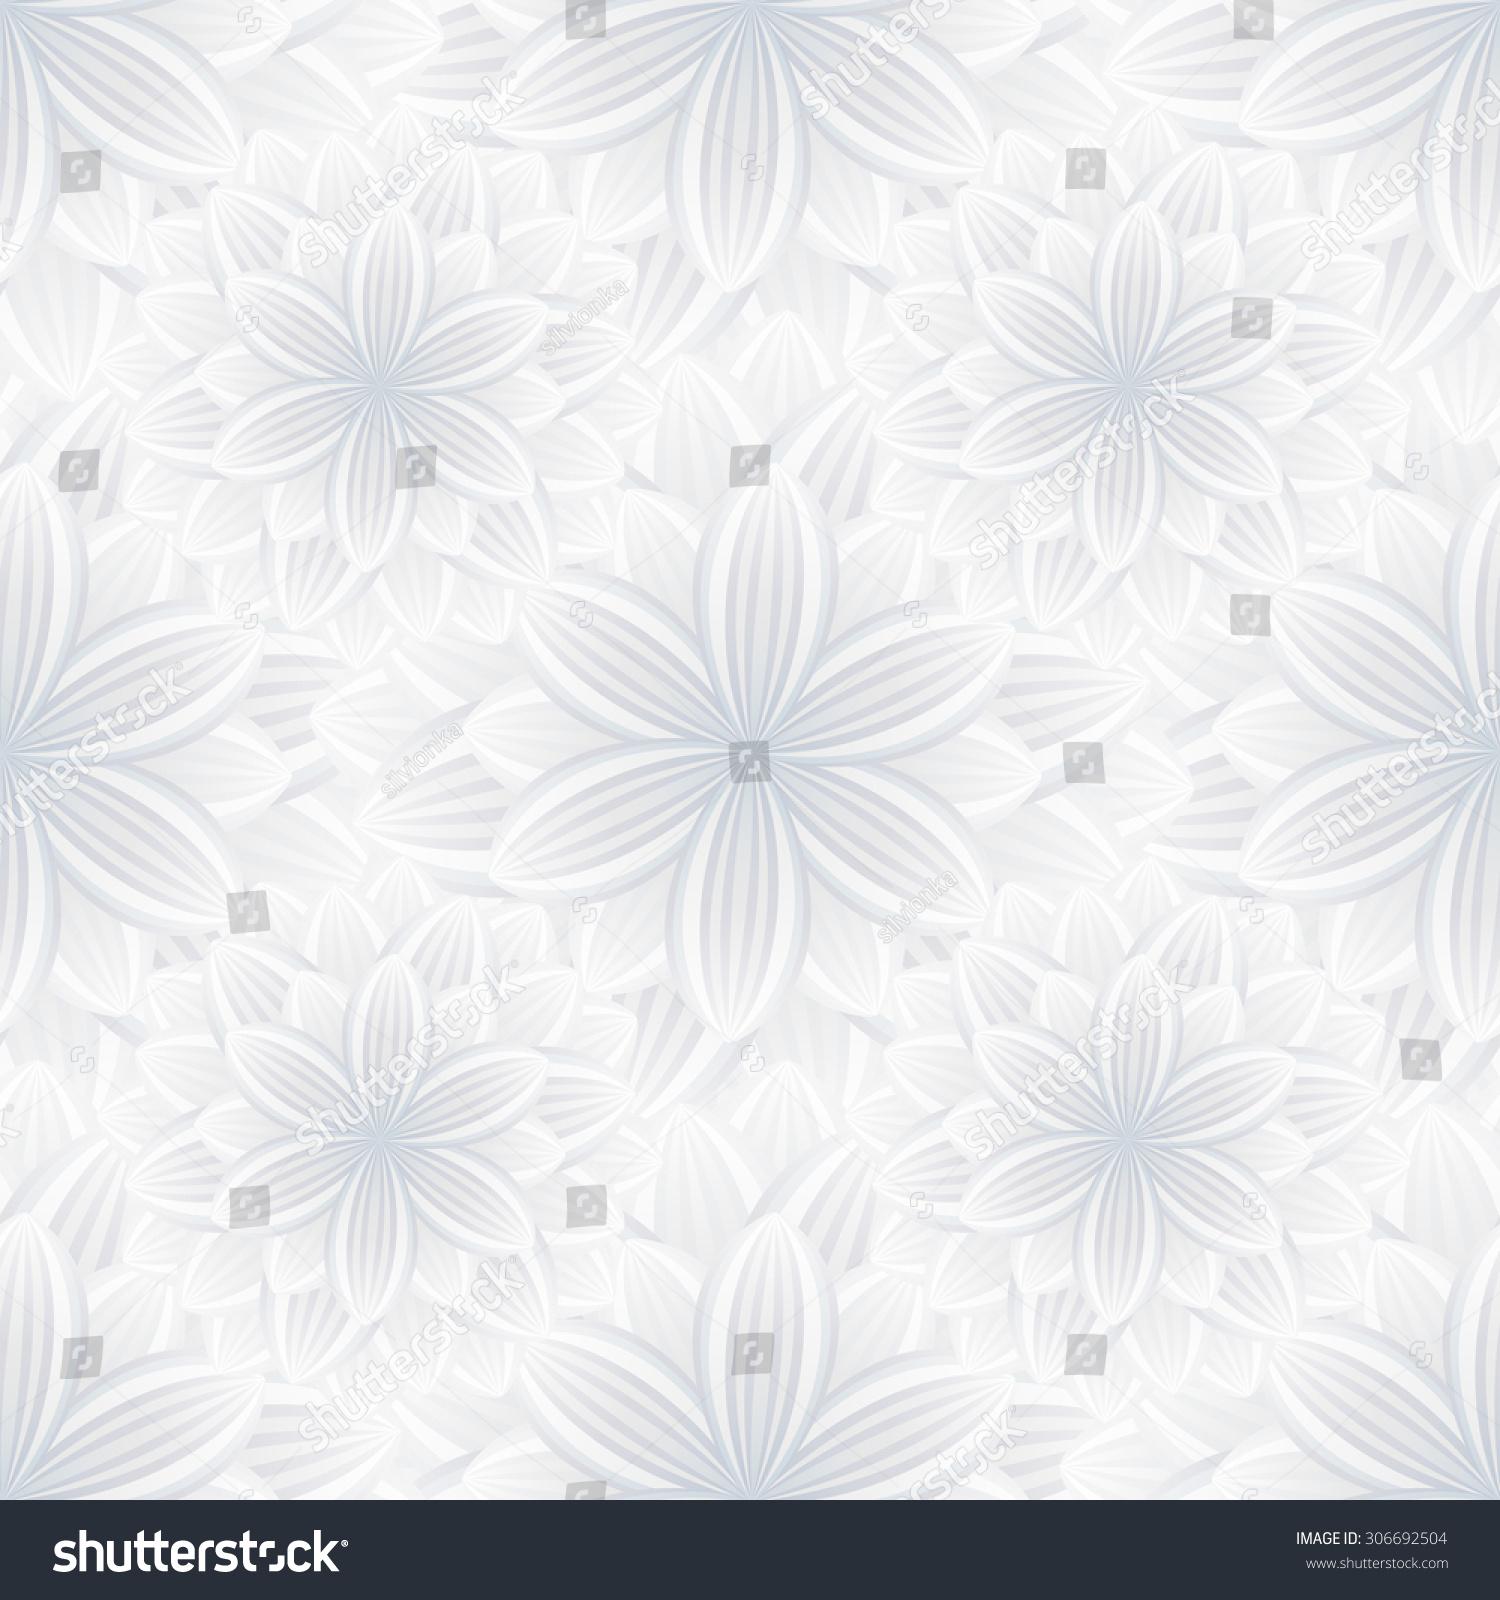 beautiful trendy nature background seamless pattern stock  - beautiful trendy nature background seamless pattern with grey  whitesummer flower chrysanthemum floral modern